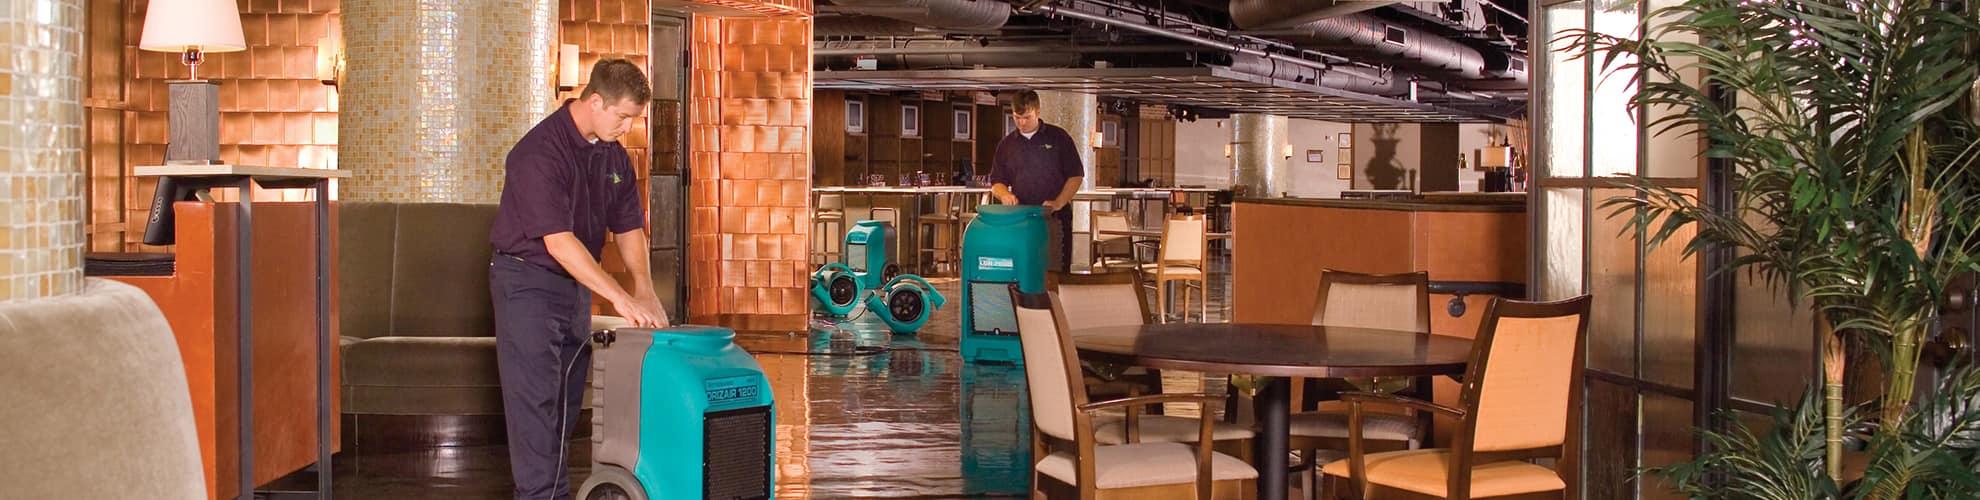 water-damage-restoration-ny-nj